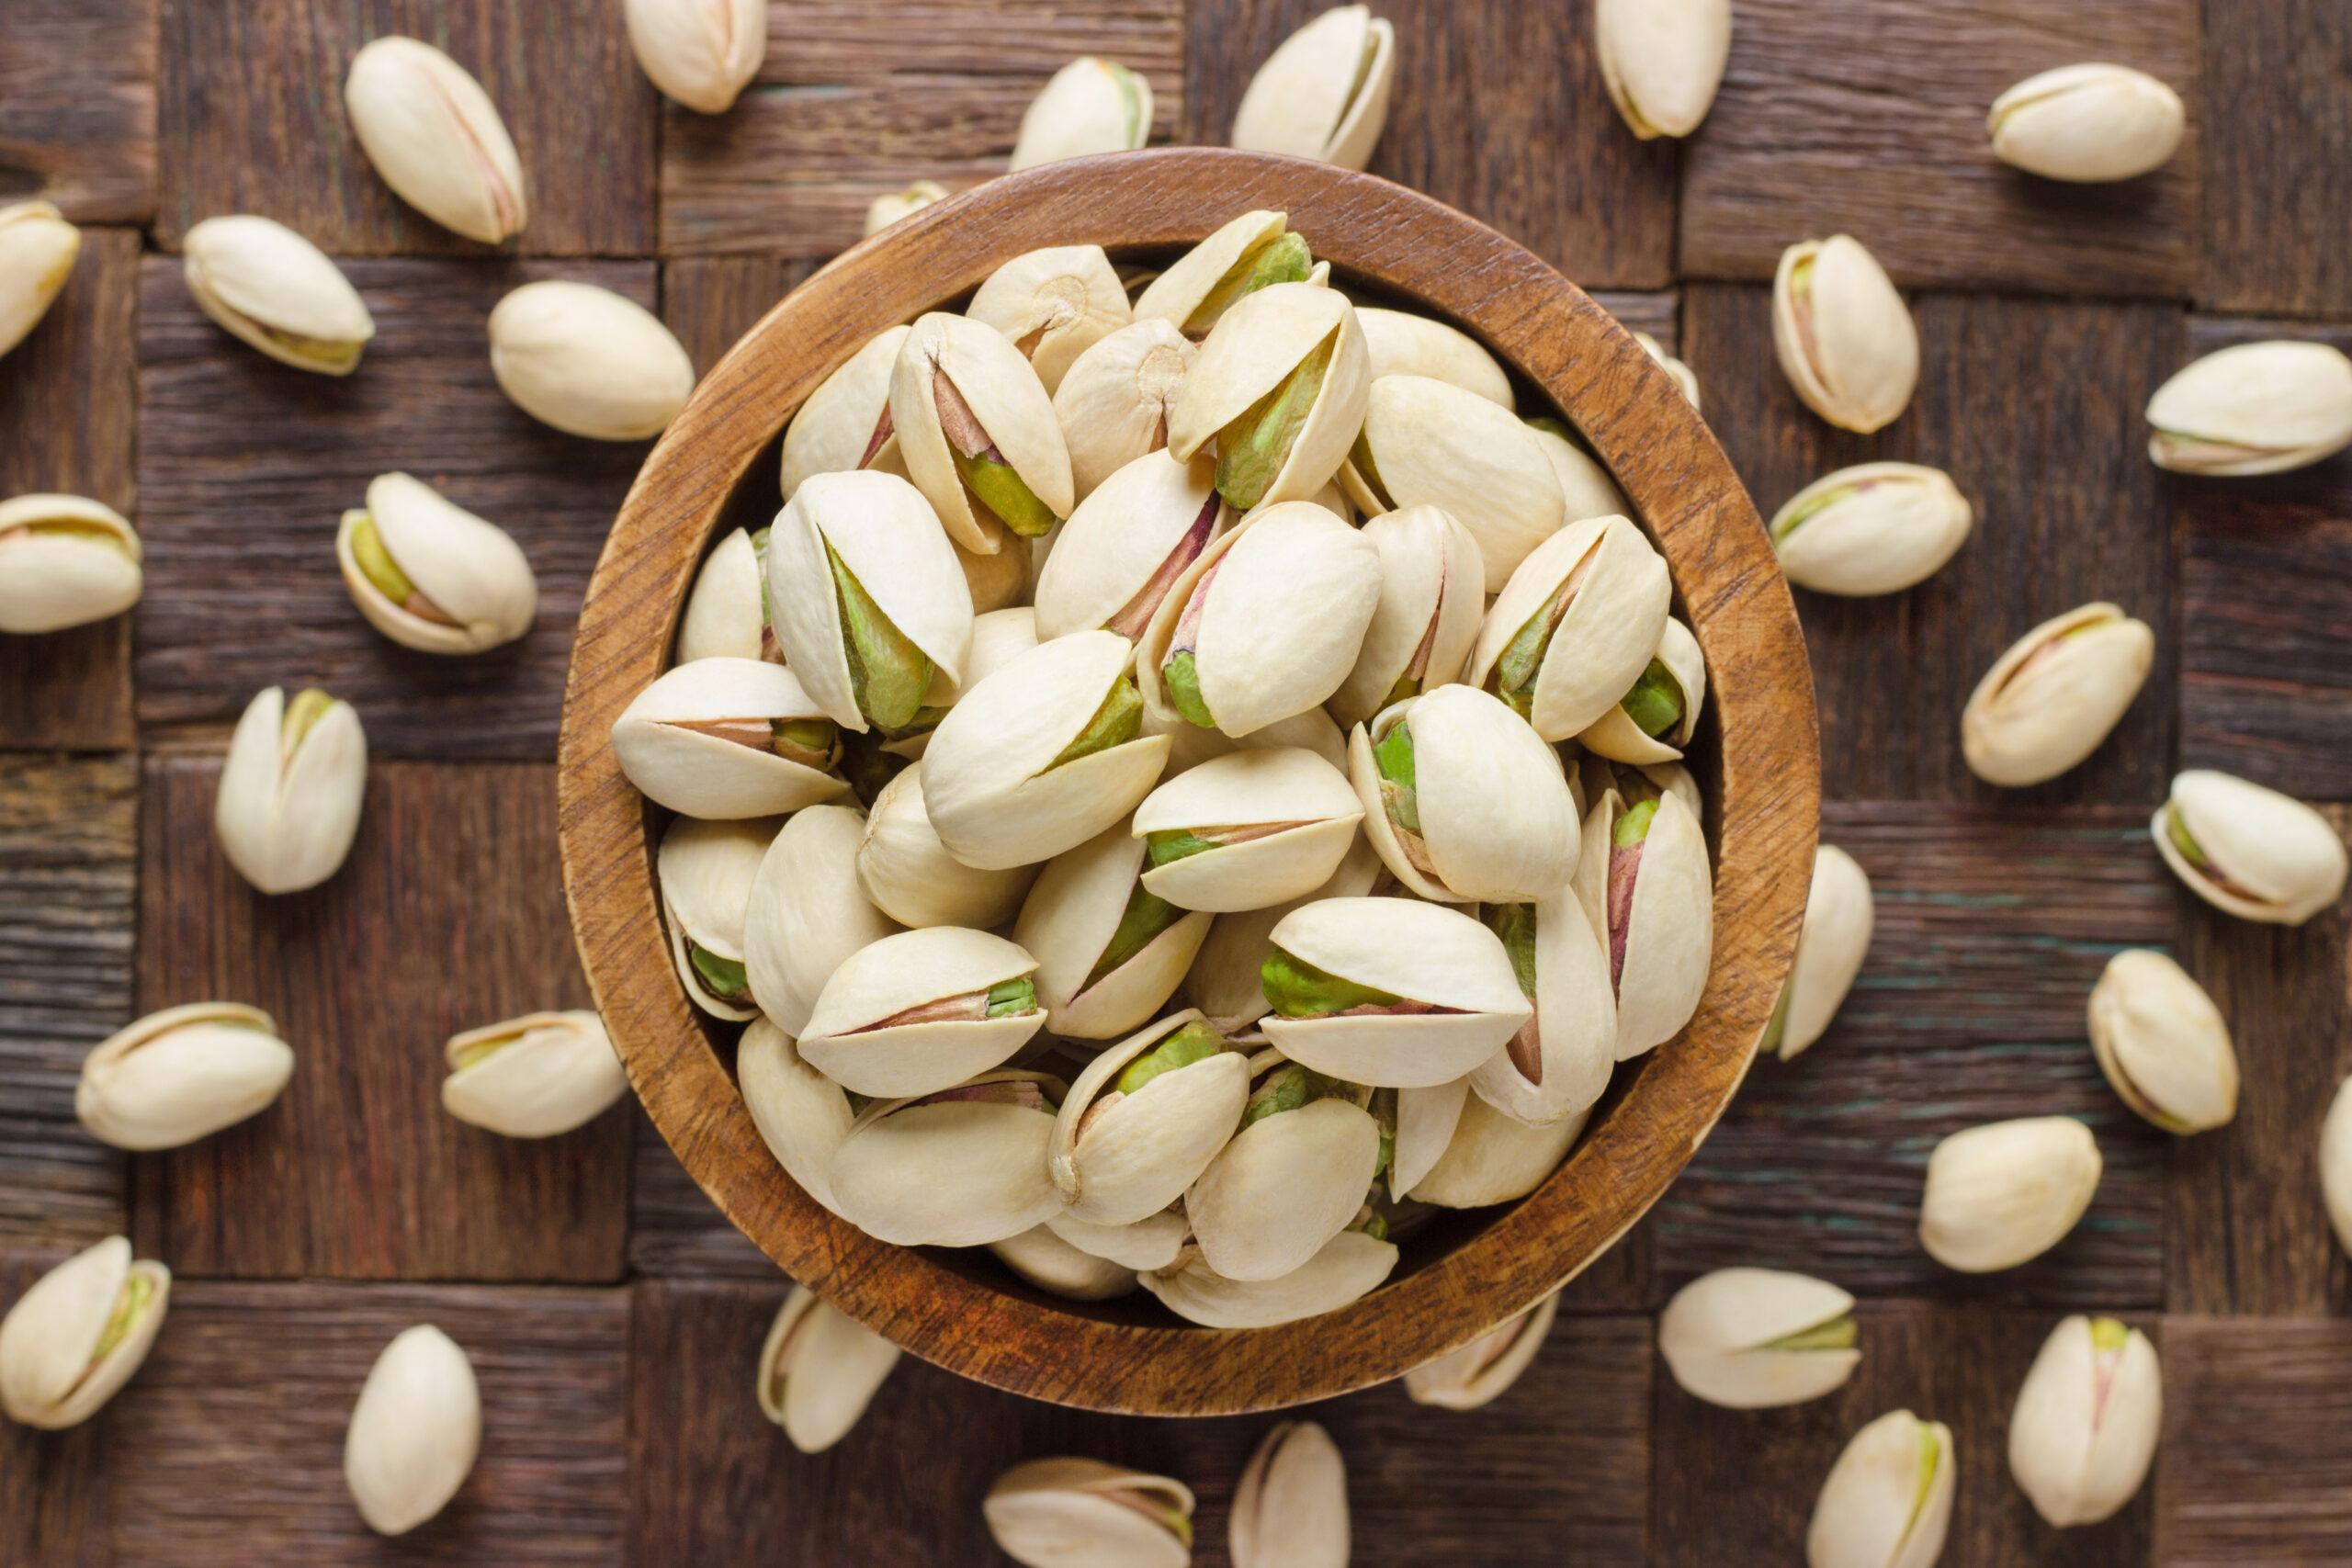 using pistachio shells as plant base